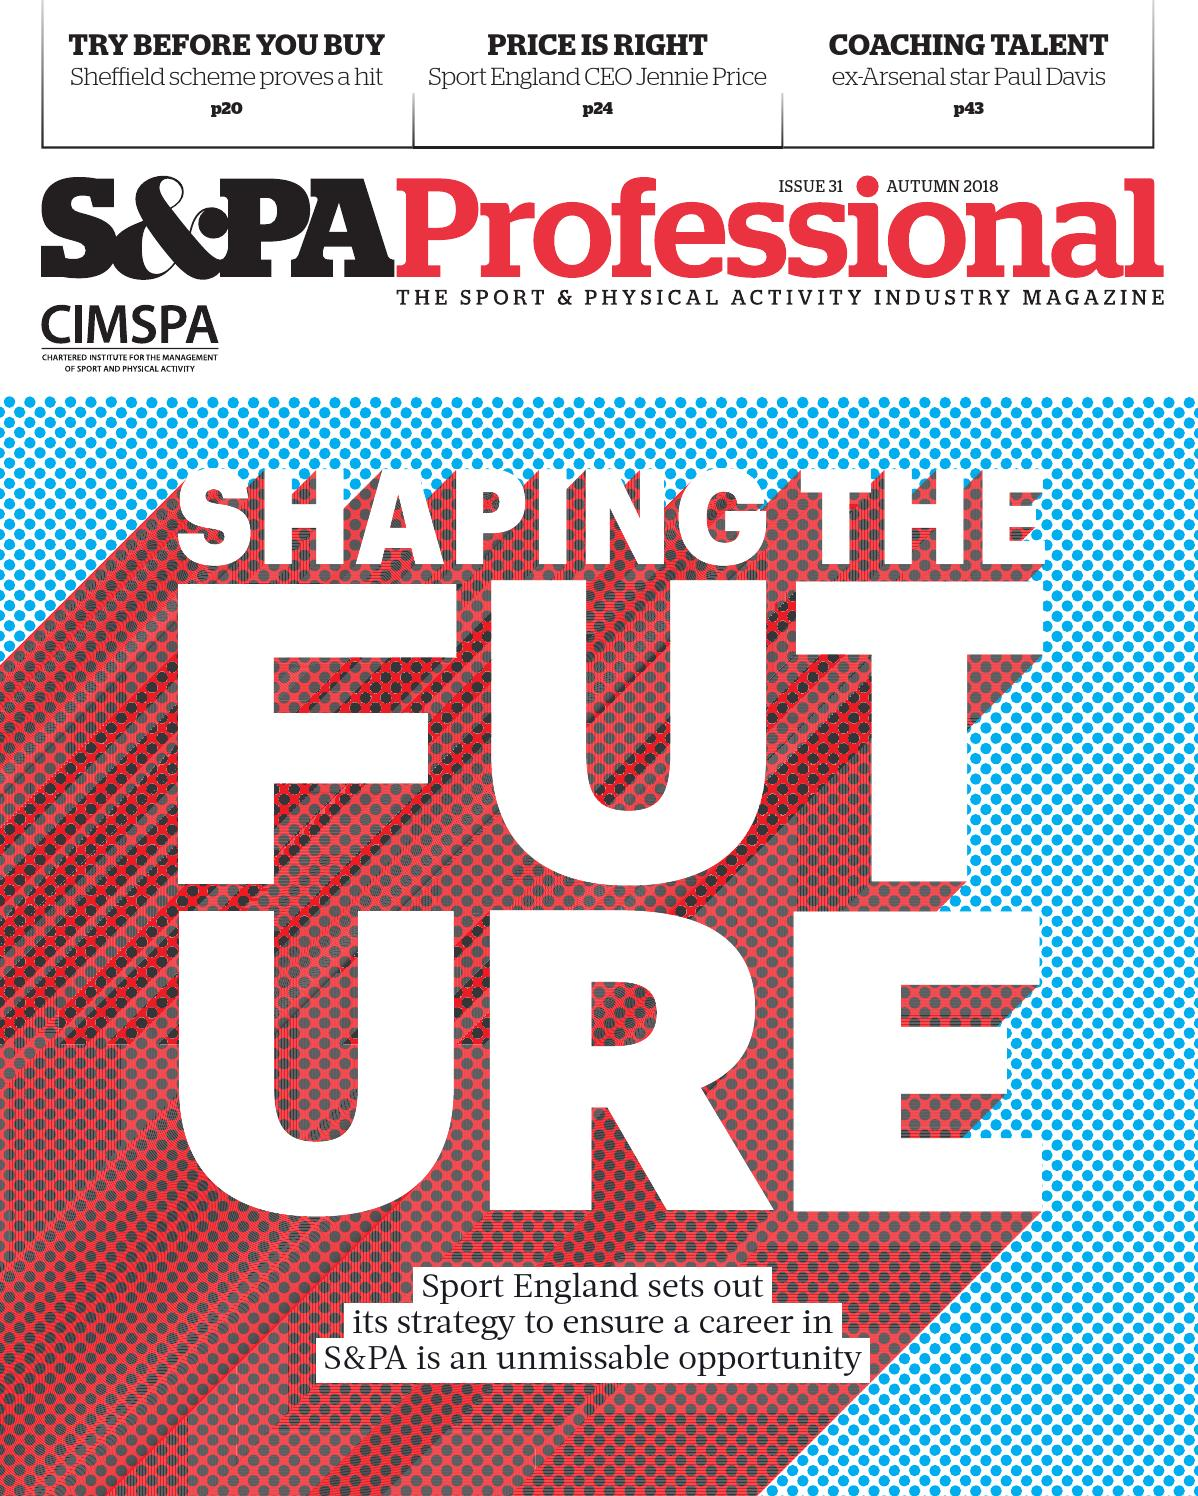 Spa Professional Magazine Autumn 18 By Cimspa Issuu Wavemaker Circuit Design Software